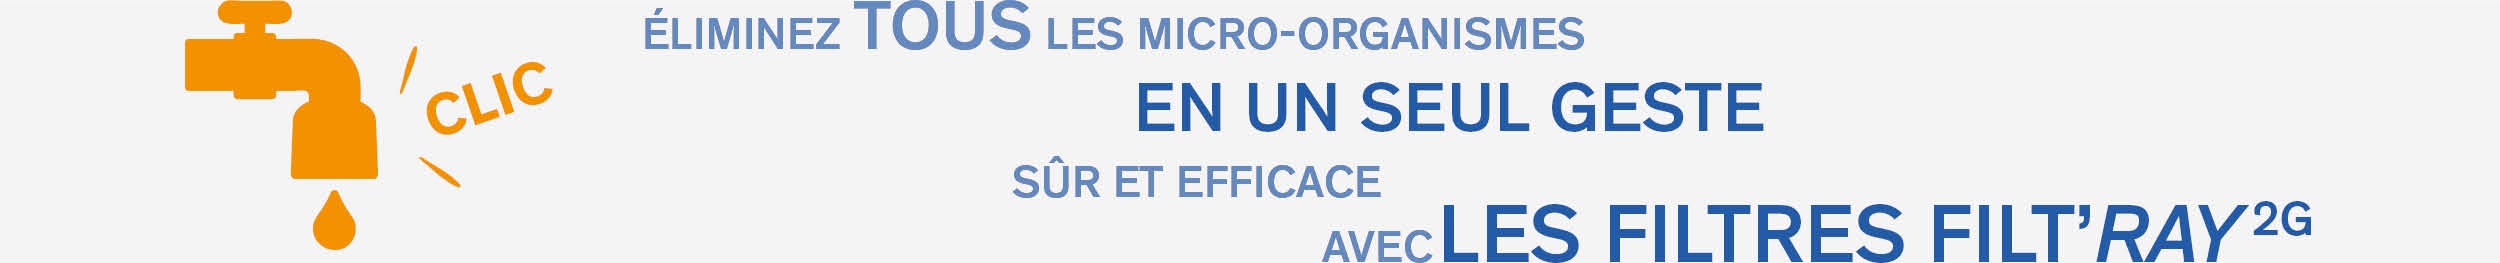 Eliminez tous les microorganismes avec les filtres FILT'RAY 2G